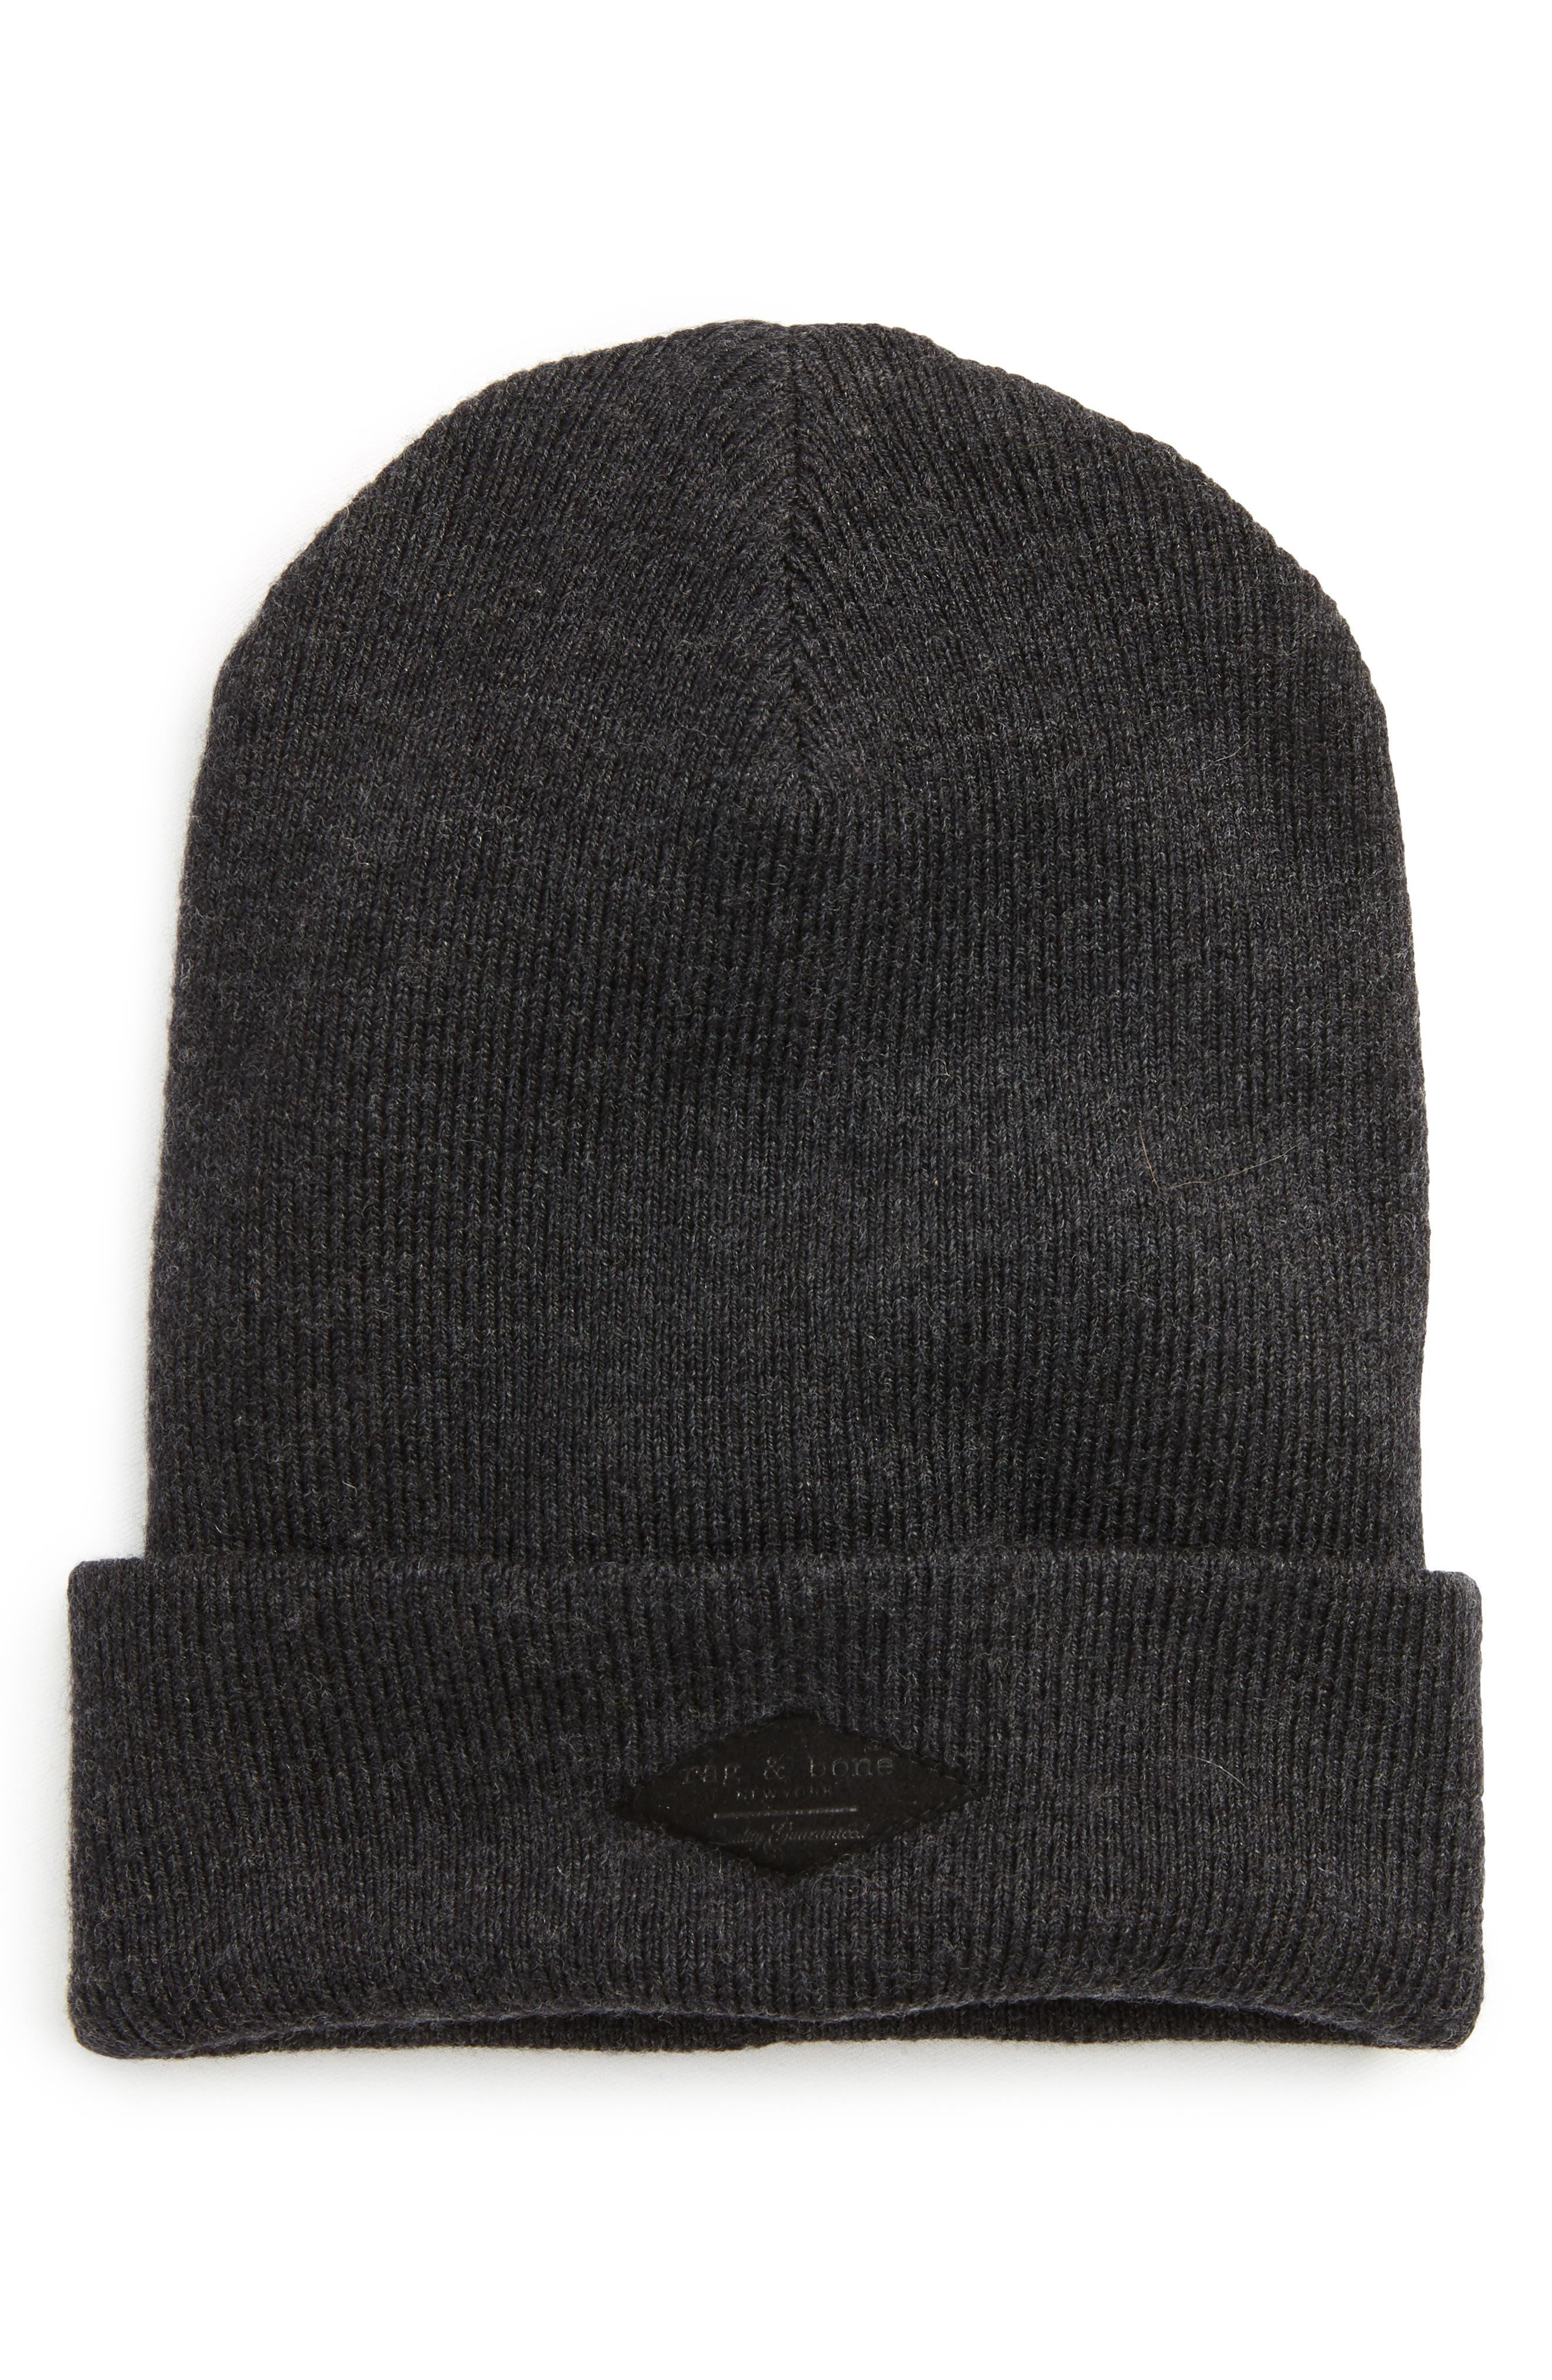 Addison Stretch Merino Wool Knit Cap,                         Main,                         color, 010